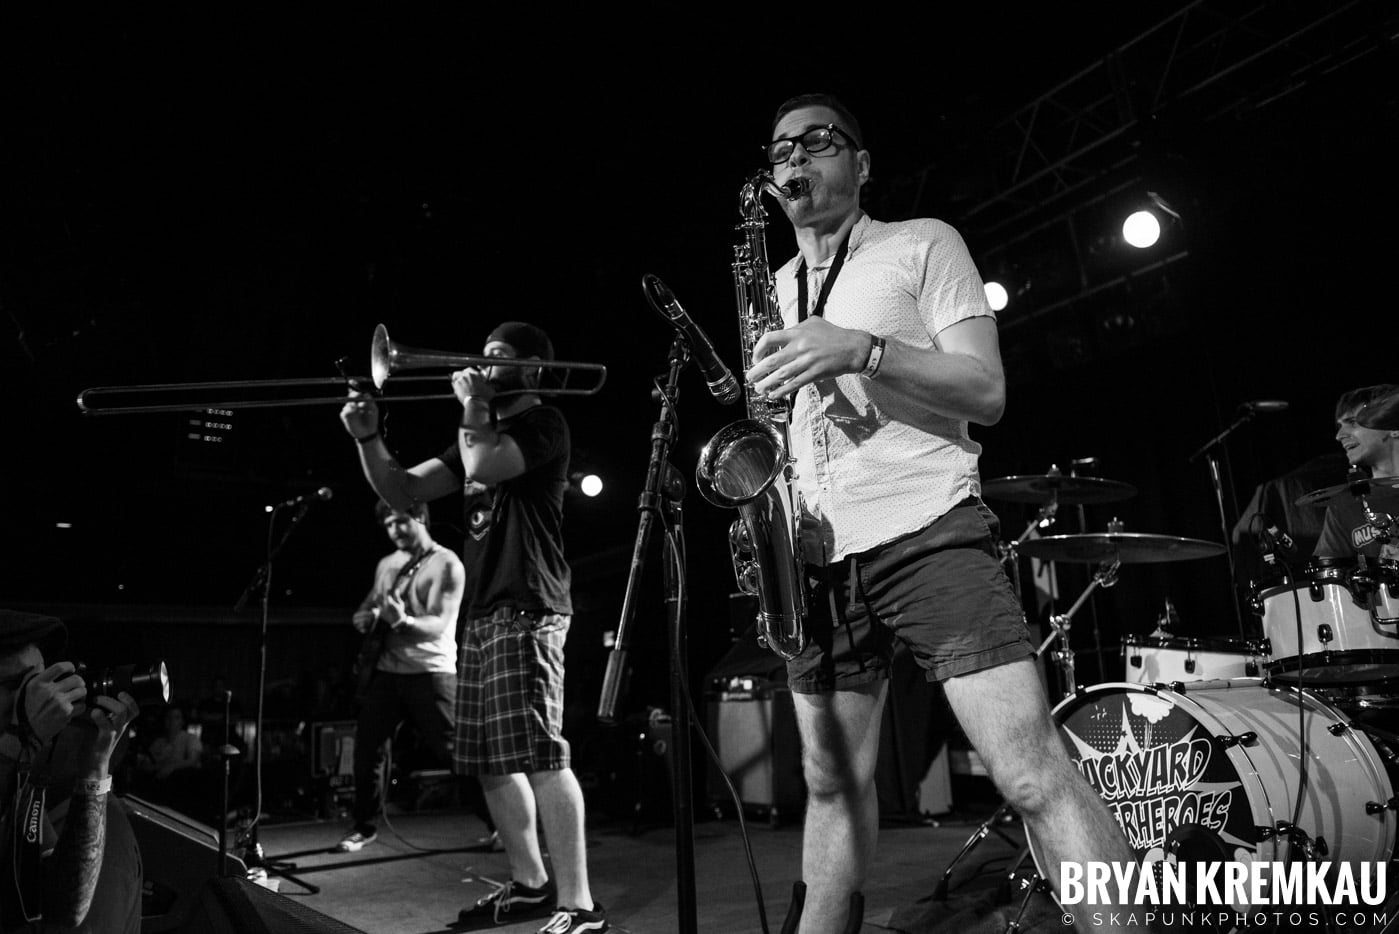 Backyard Superheroes @ Starland Ballroom, Sayreville, NJ - 7.29.17 (27)